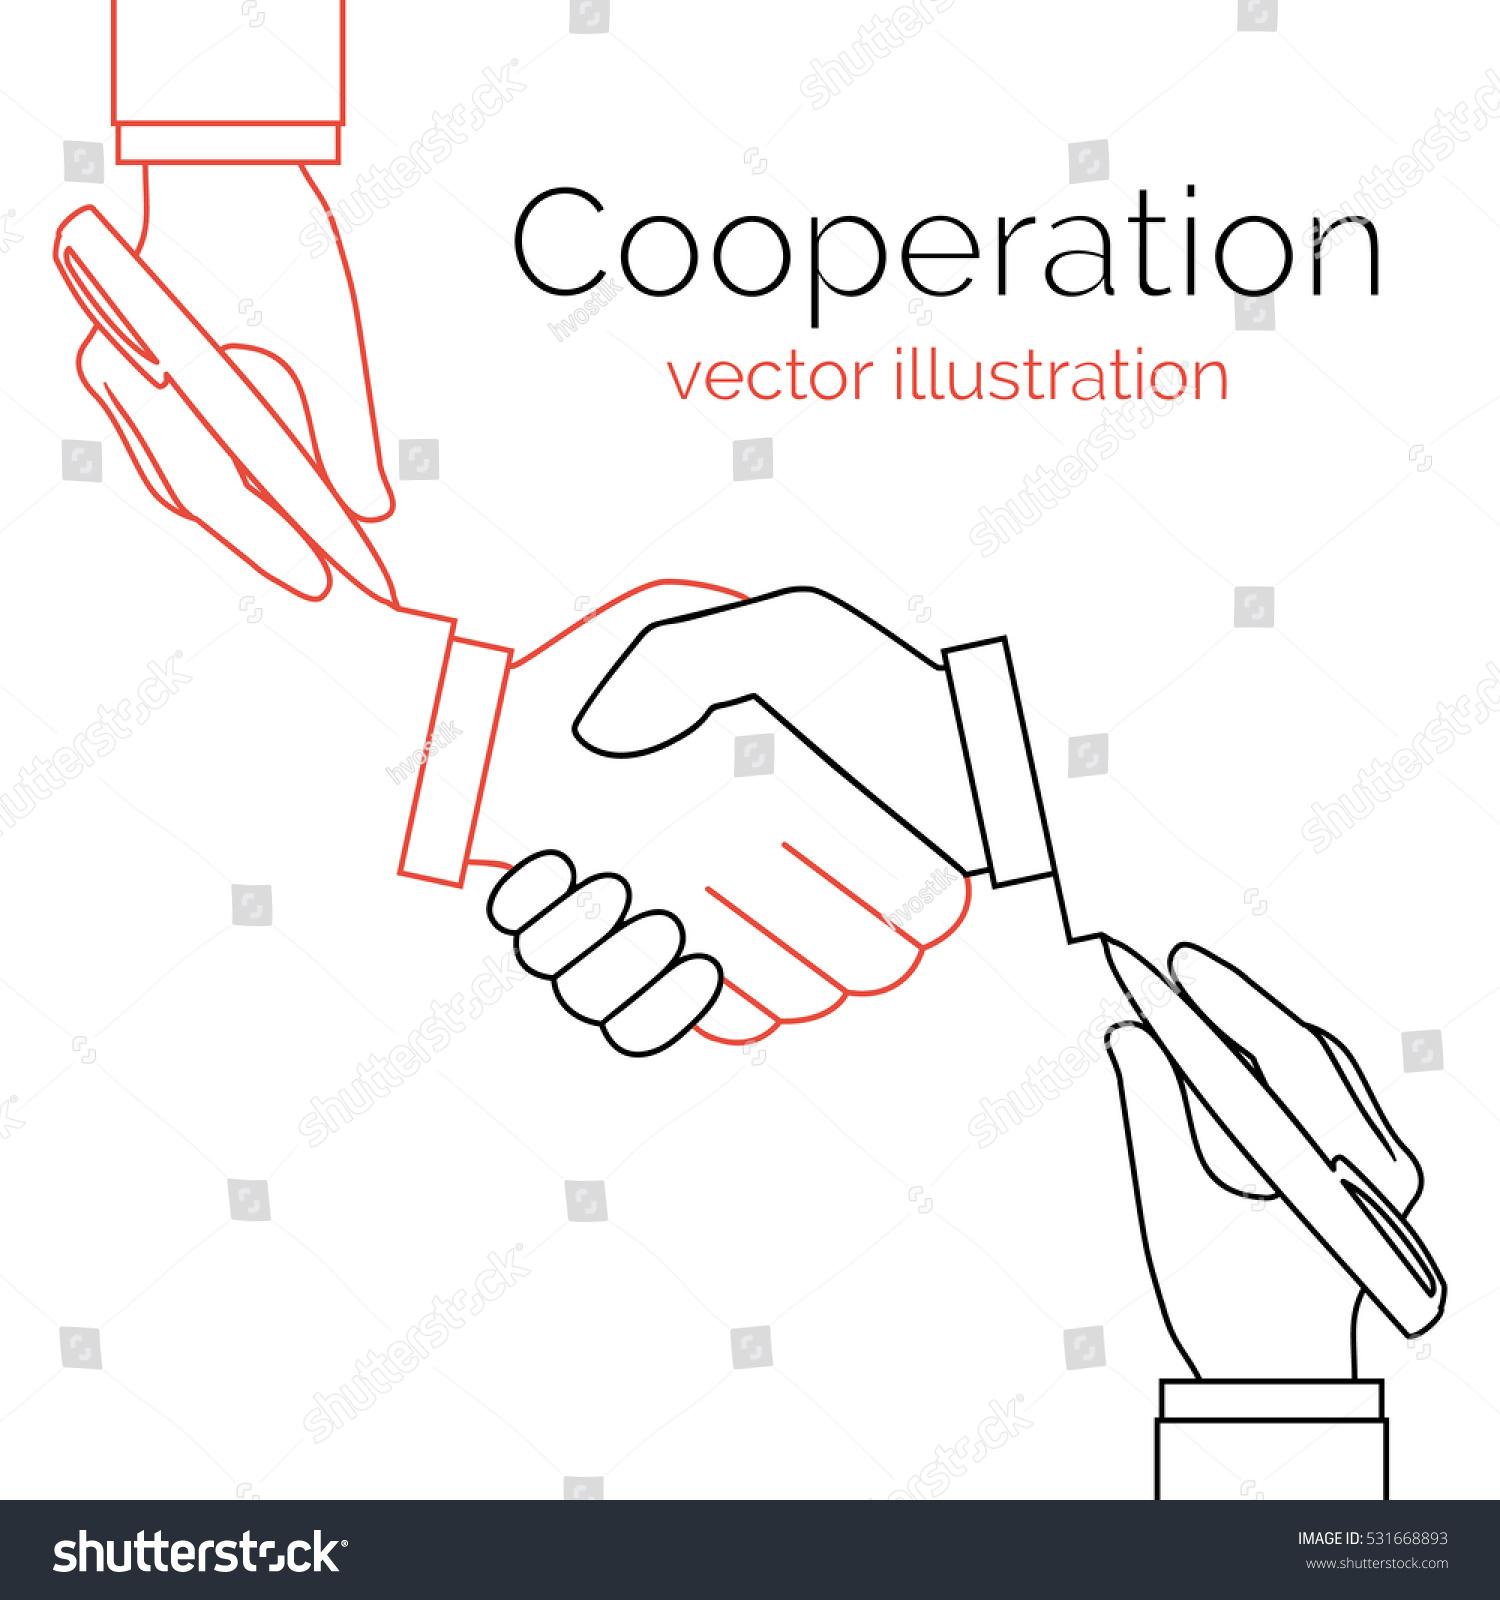 cooperation concept business partnership icon handshake stock vector 531668893 shutterstock. Black Bedroom Furniture Sets. Home Design Ideas